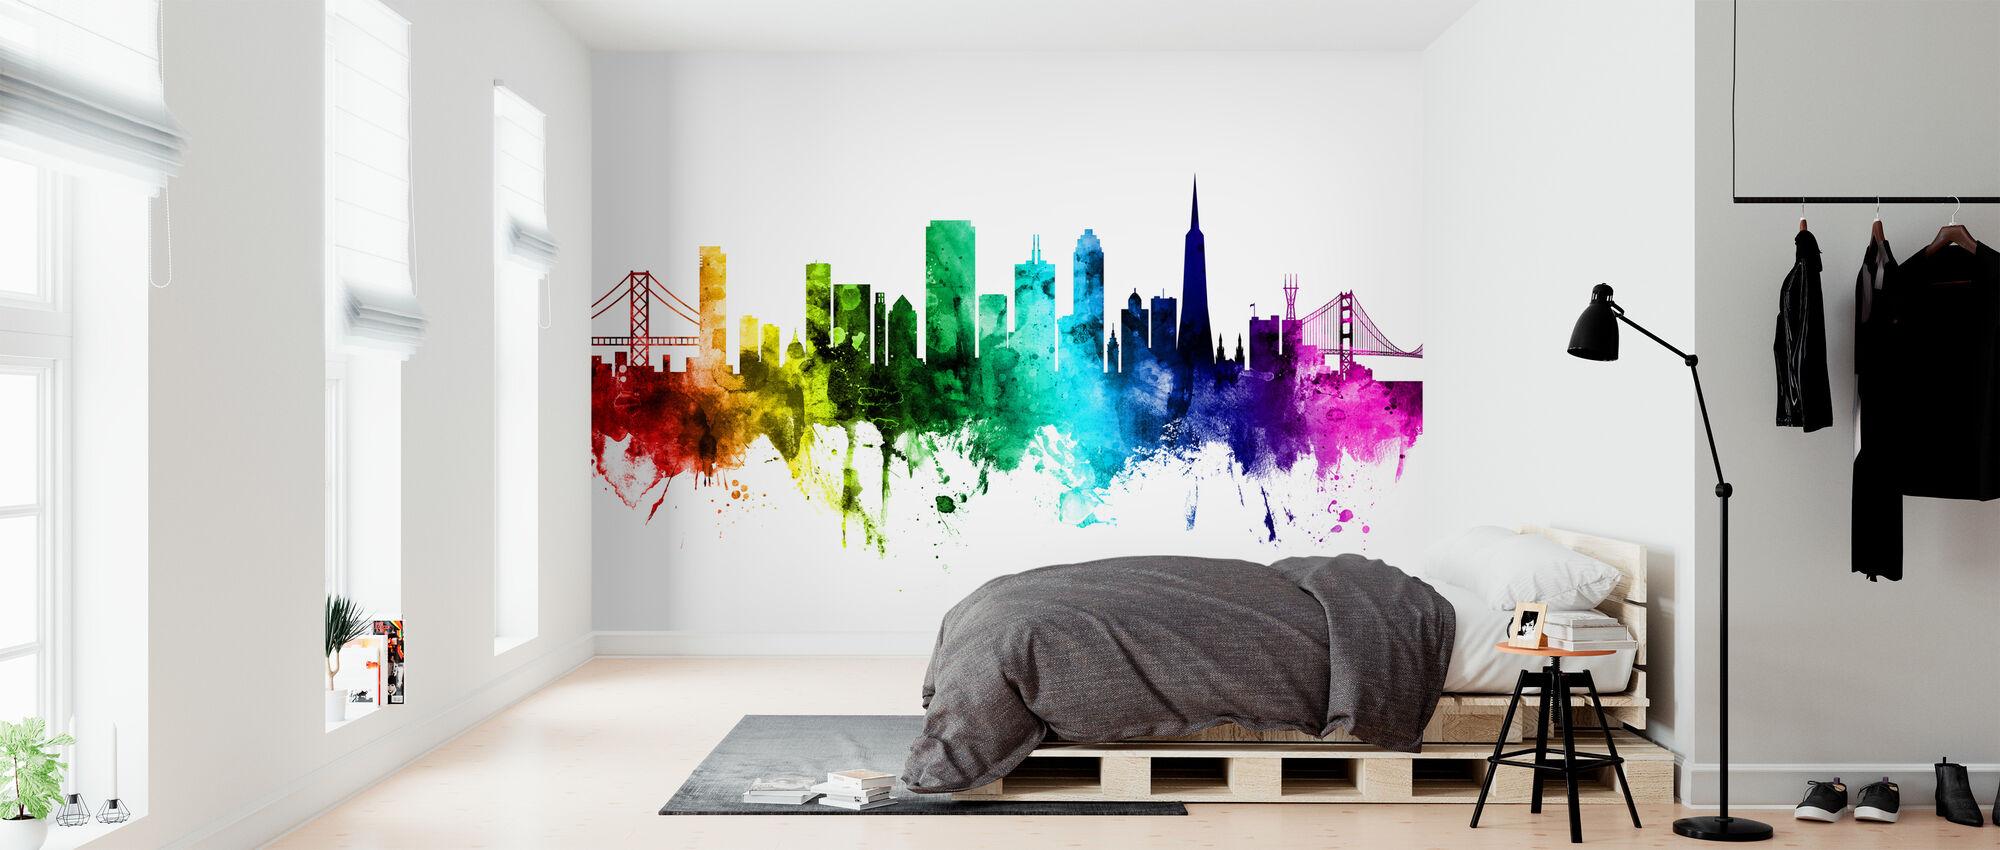 San Francisco City Skyline - Tapet - Soverom